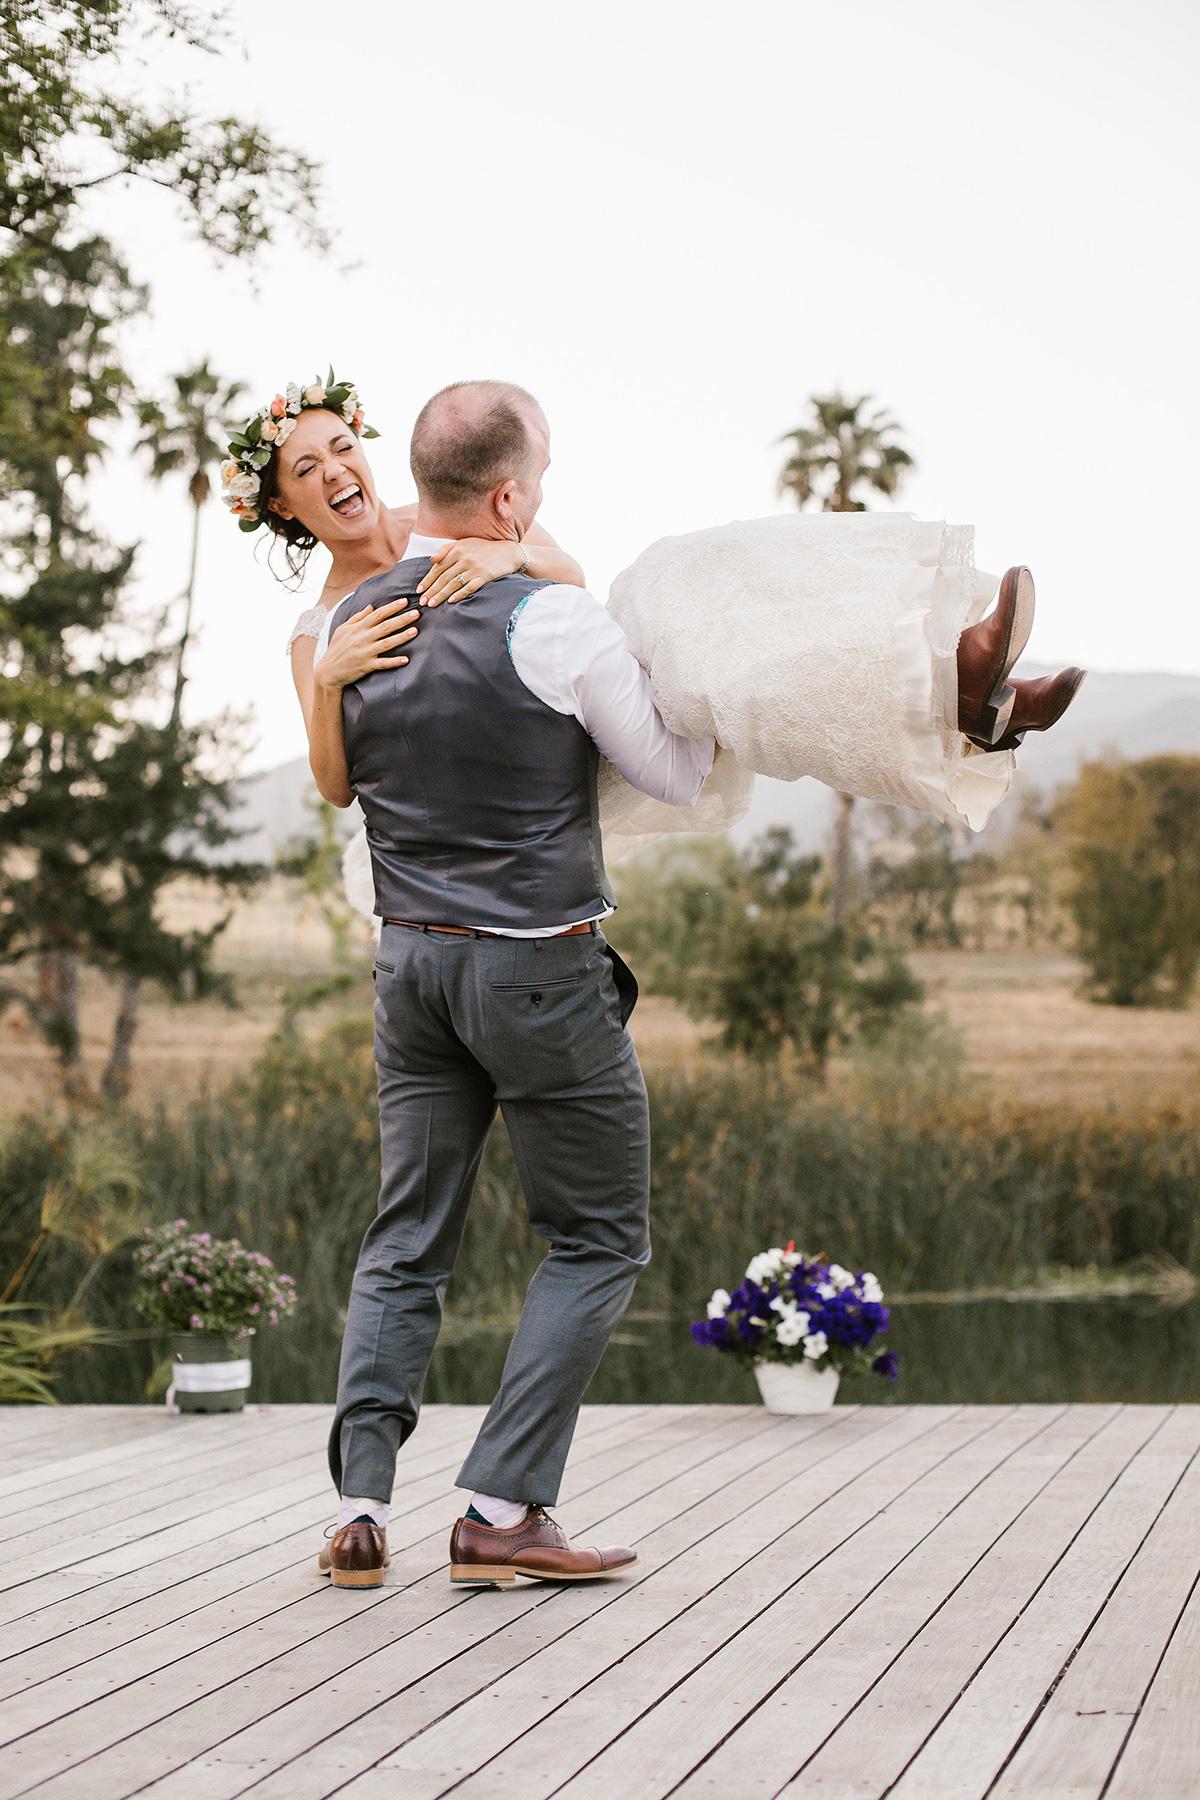 Sarah_Grant wedding first dance goleta 2018 a